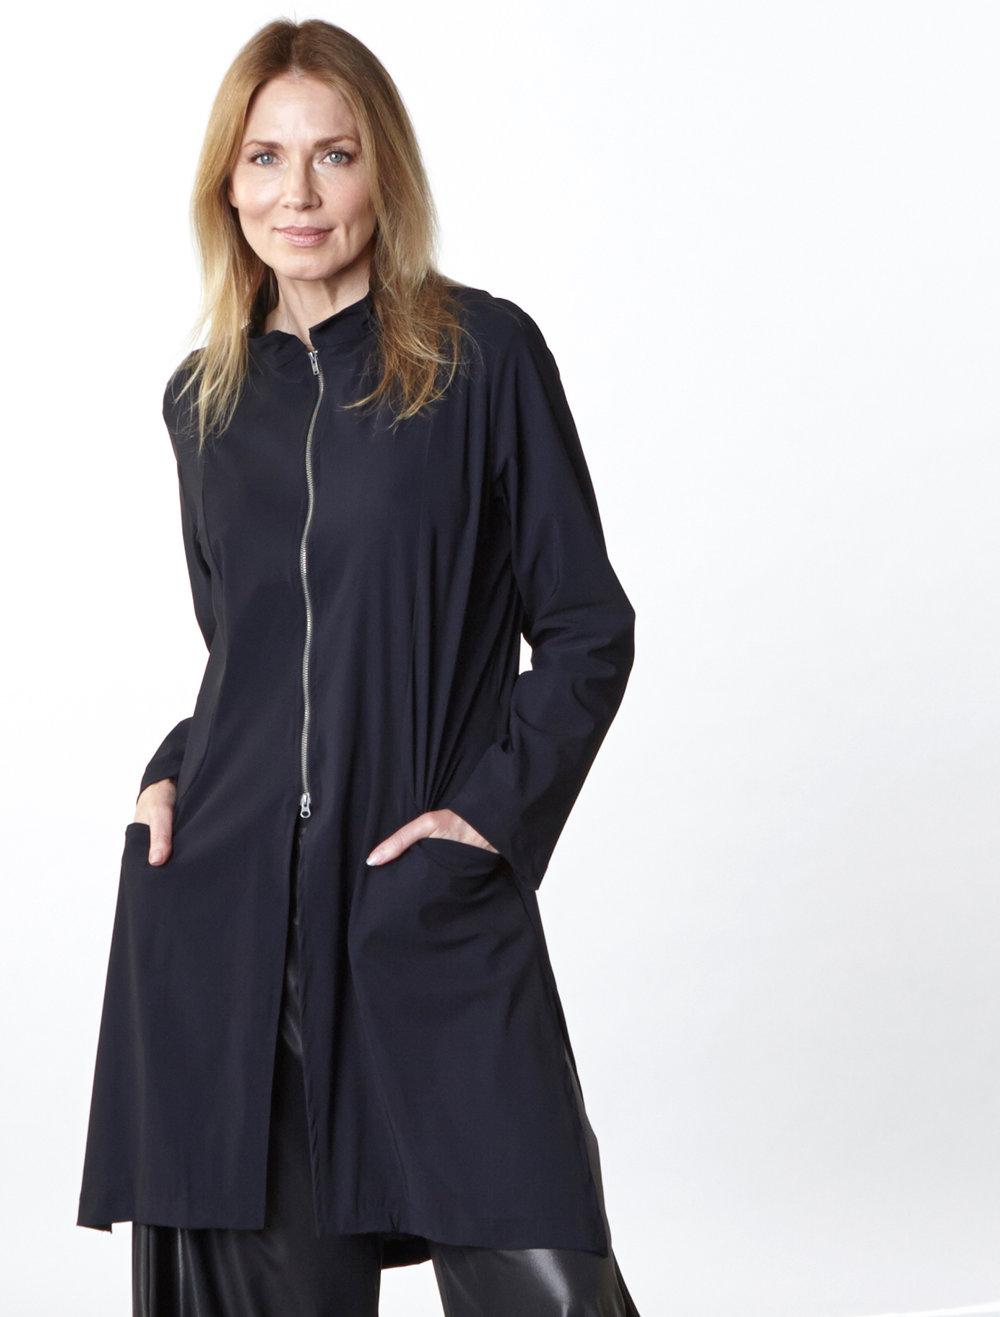 Emerson Jacket in Black Italian Microfiber Jersey, Hamish Pant in Black Italian Laminato